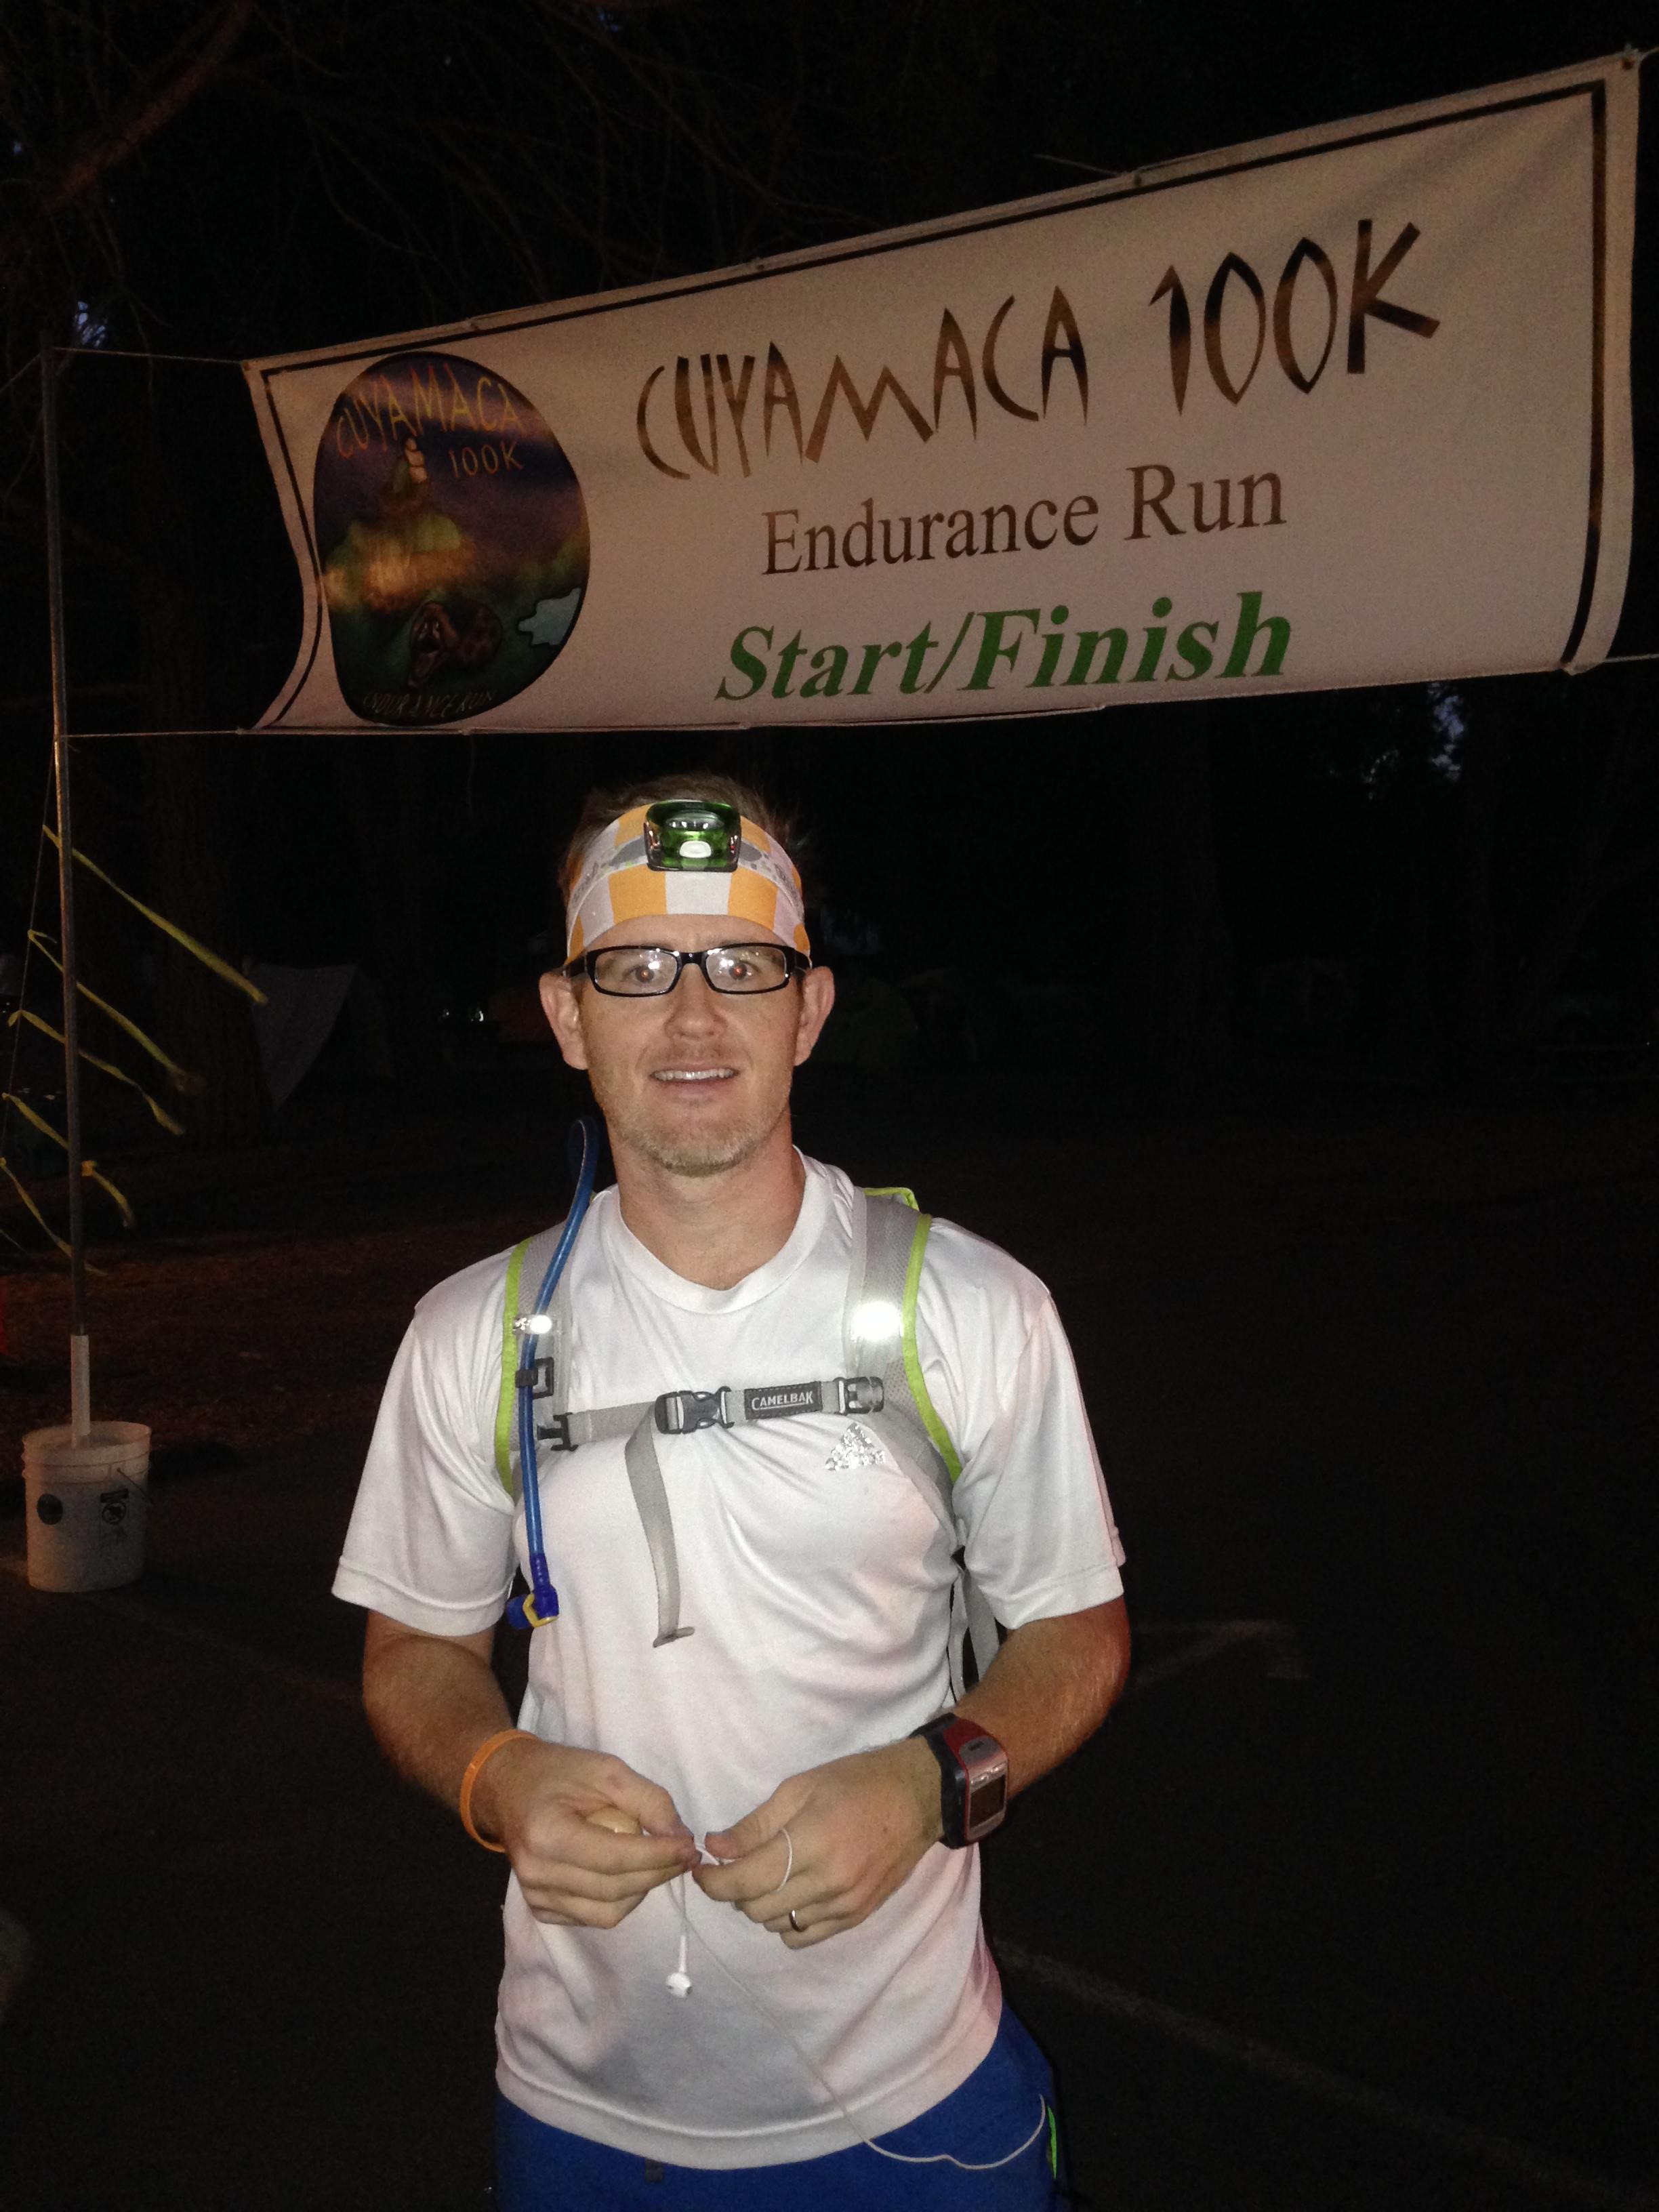 Start of the Cuyamaca 100k Run, 2014